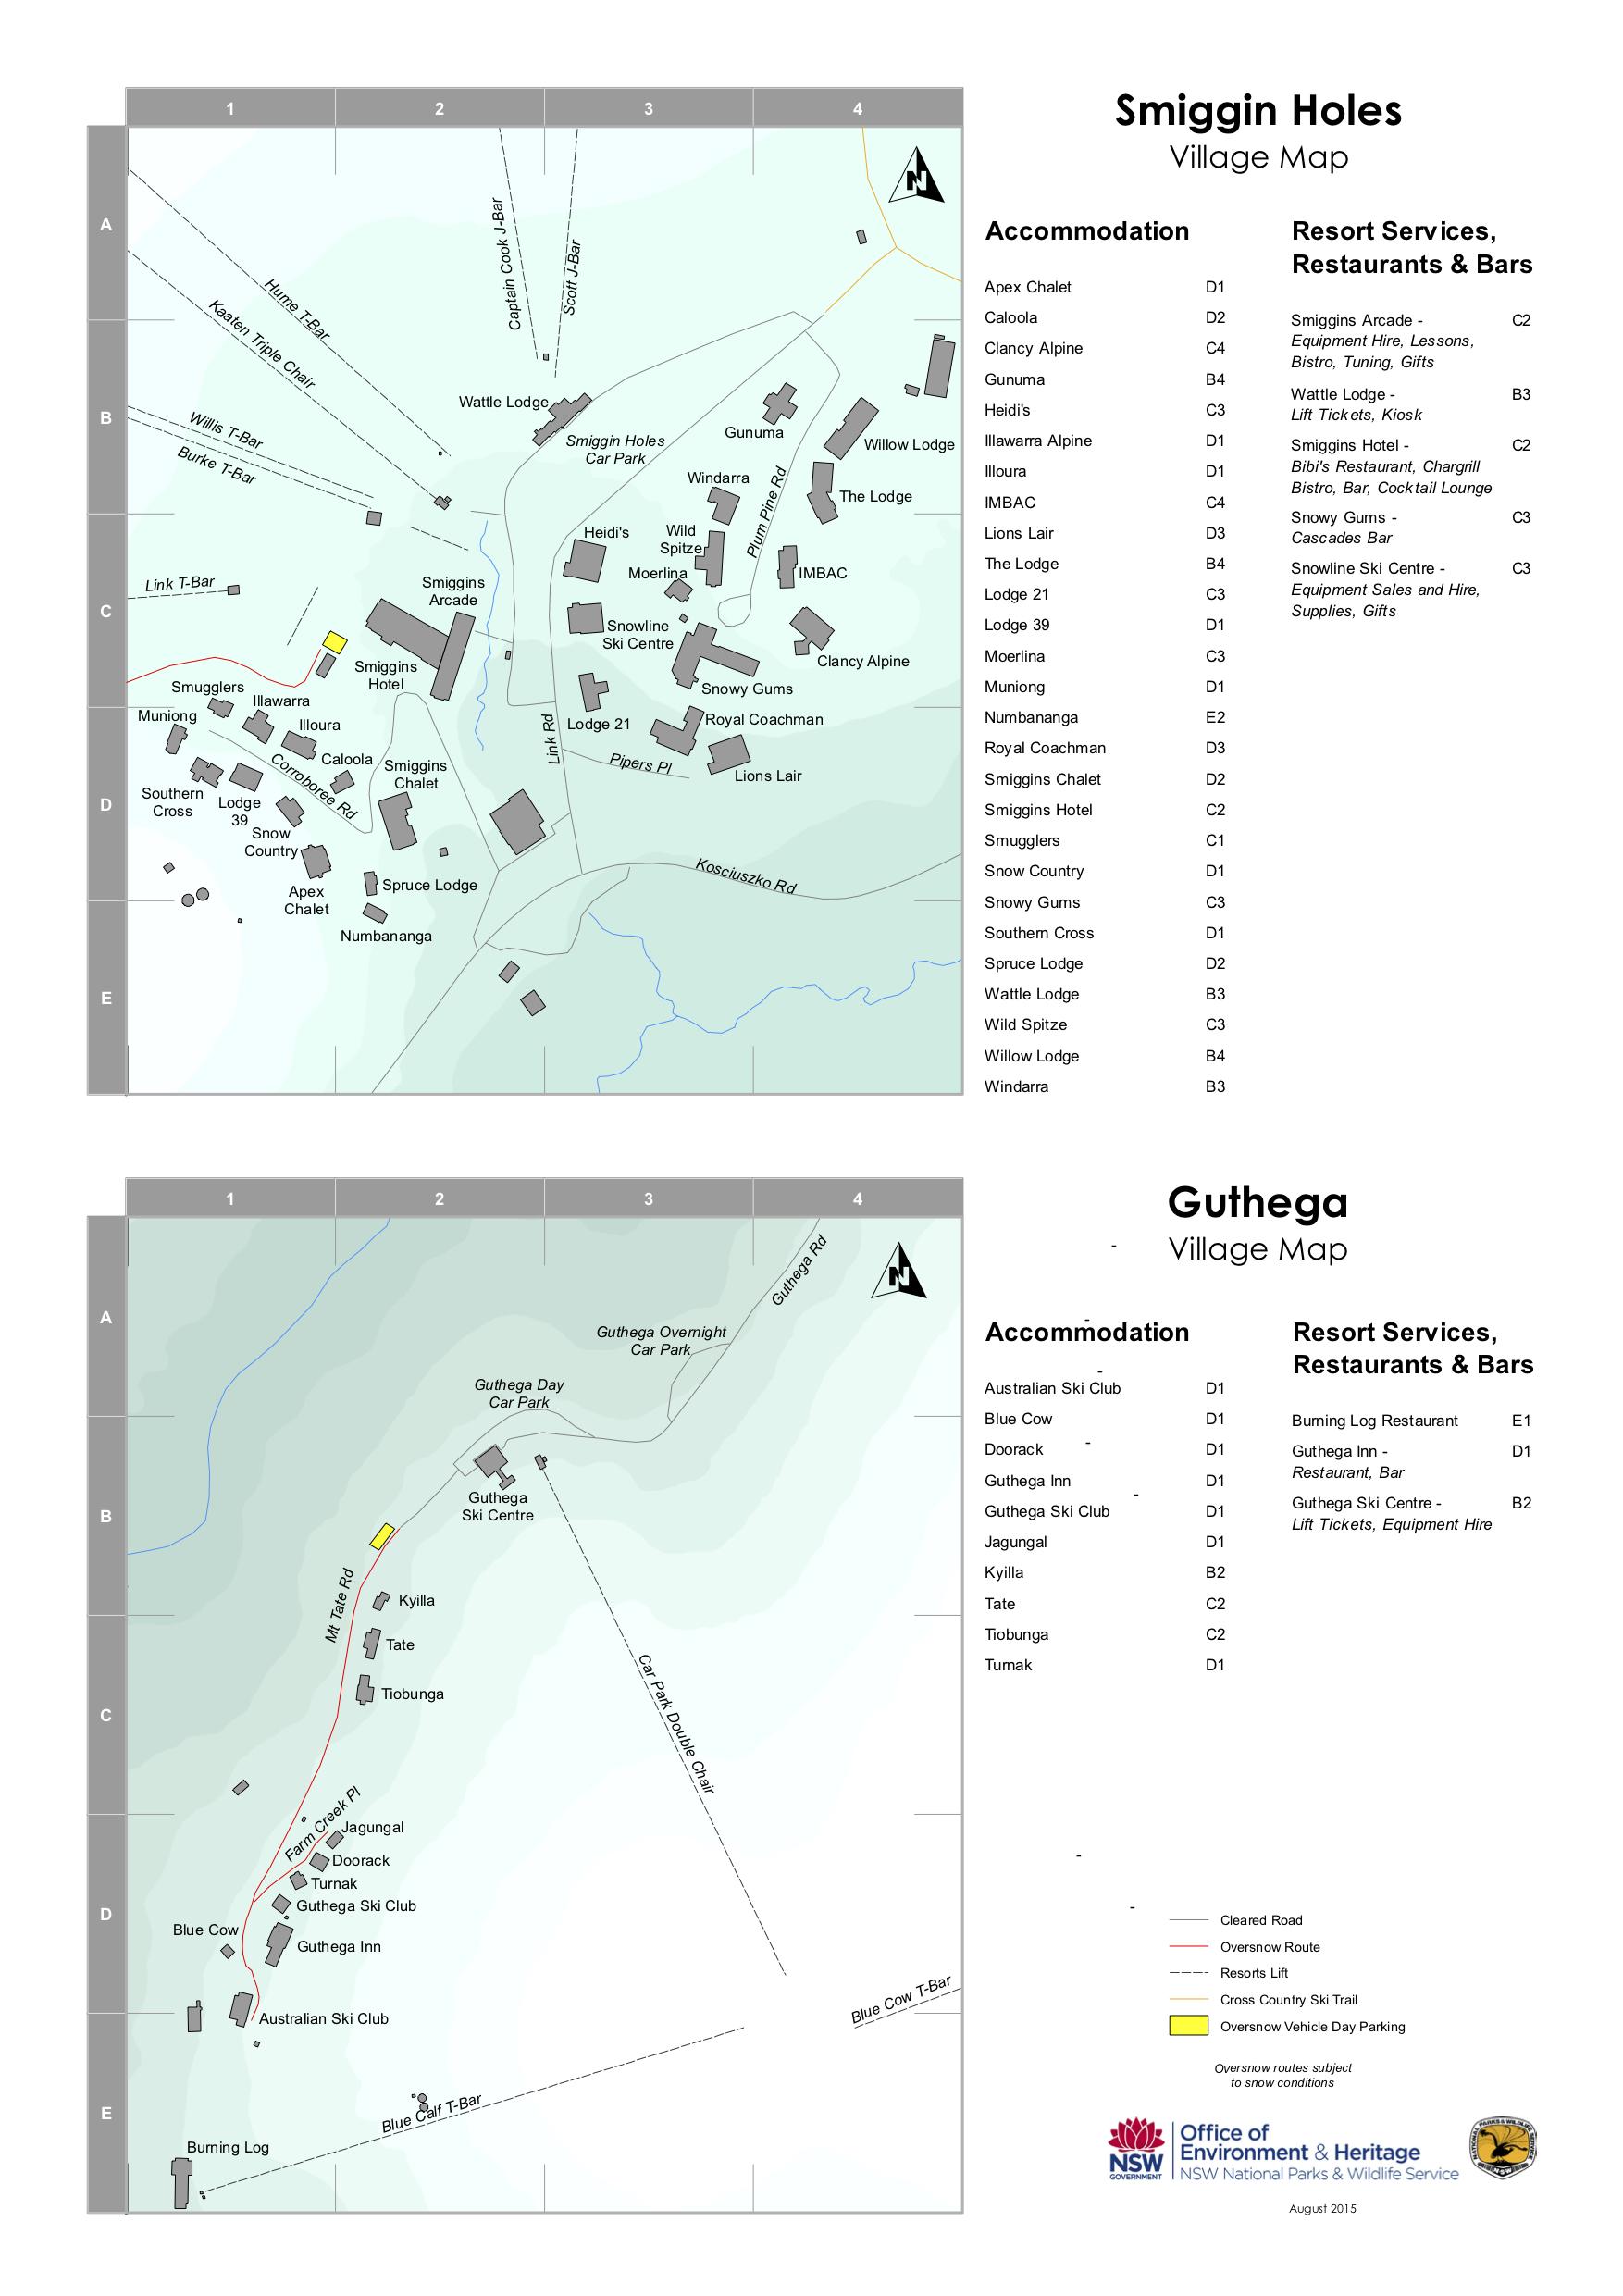 map-smiggin-holes-guthega-2805